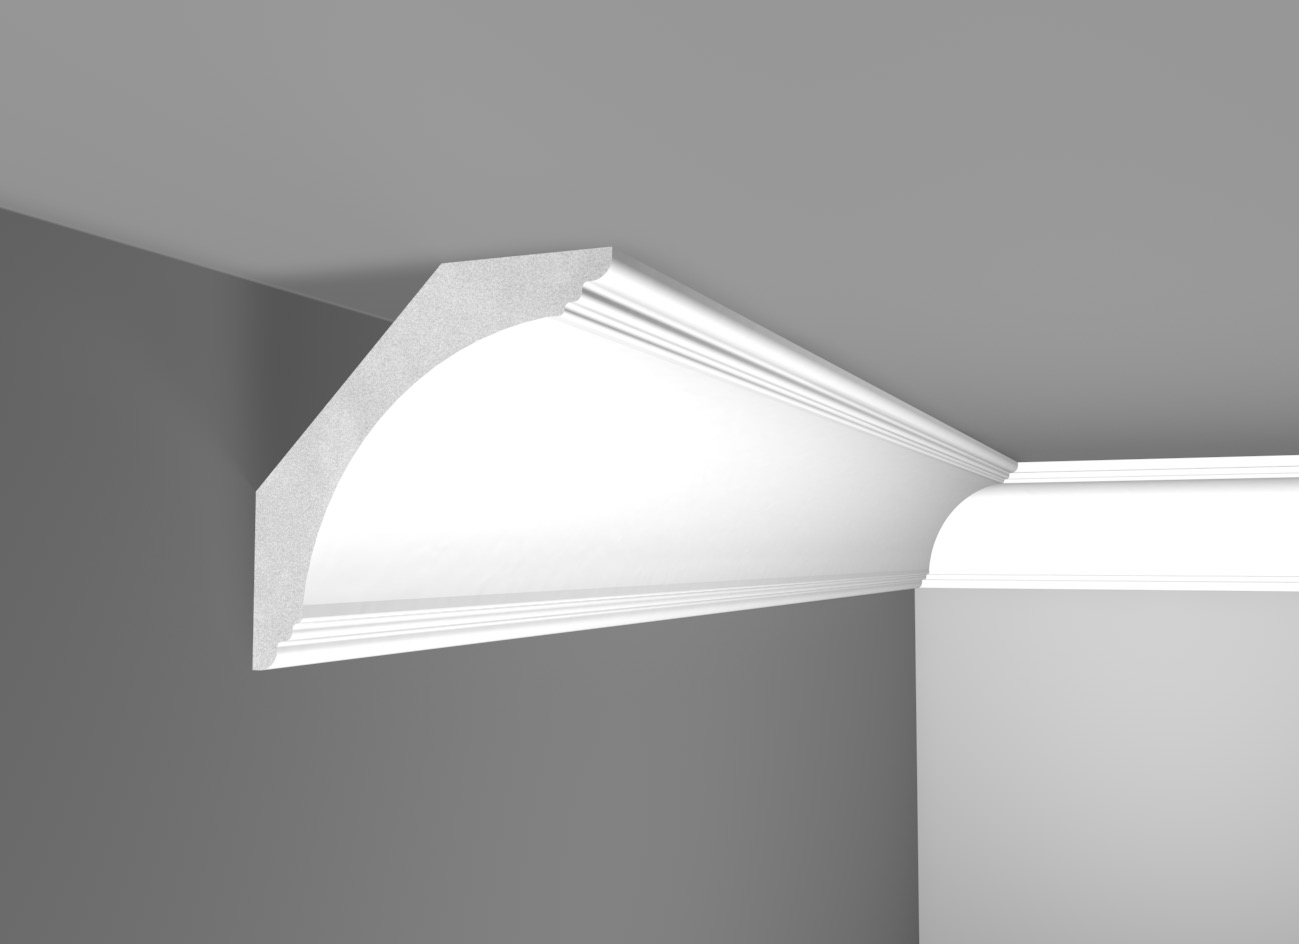 G 120 - Cornice in polistirene gessato bianco - Decorget - Ital Decori - Image 0